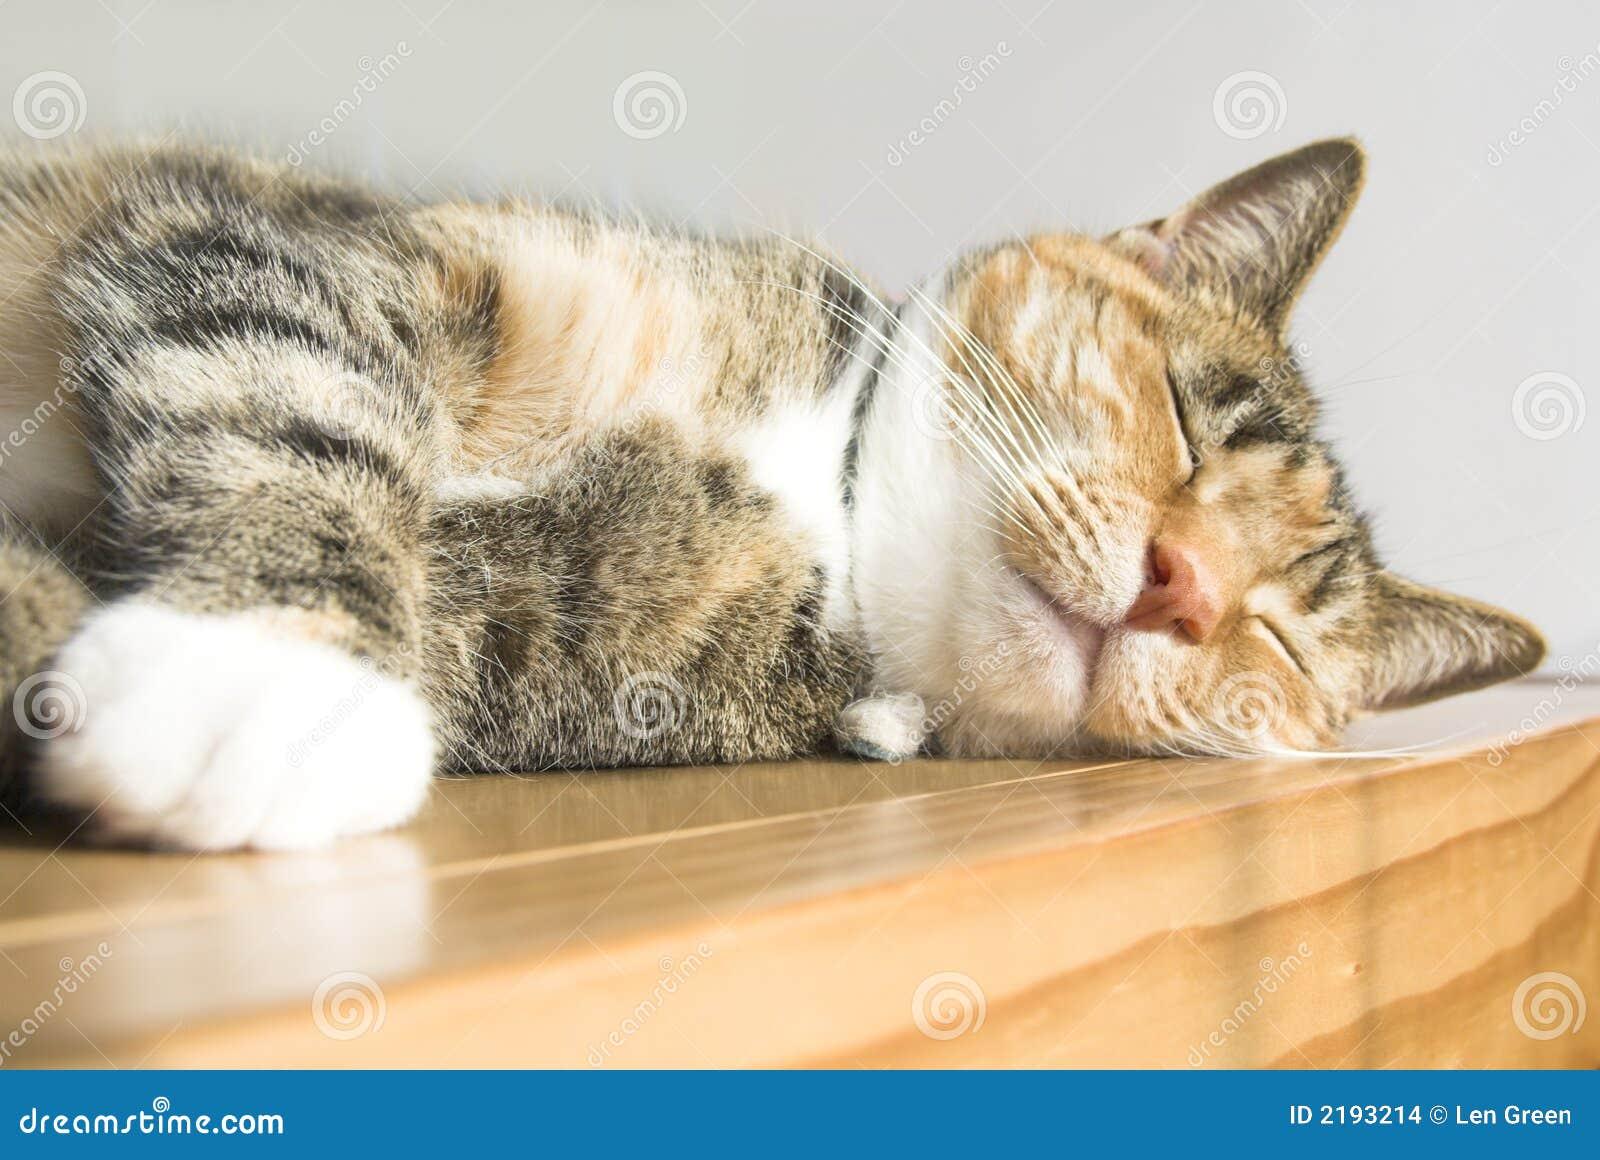 cute cat stock photo. image of feline, doze, dozing, dreams - 2193214